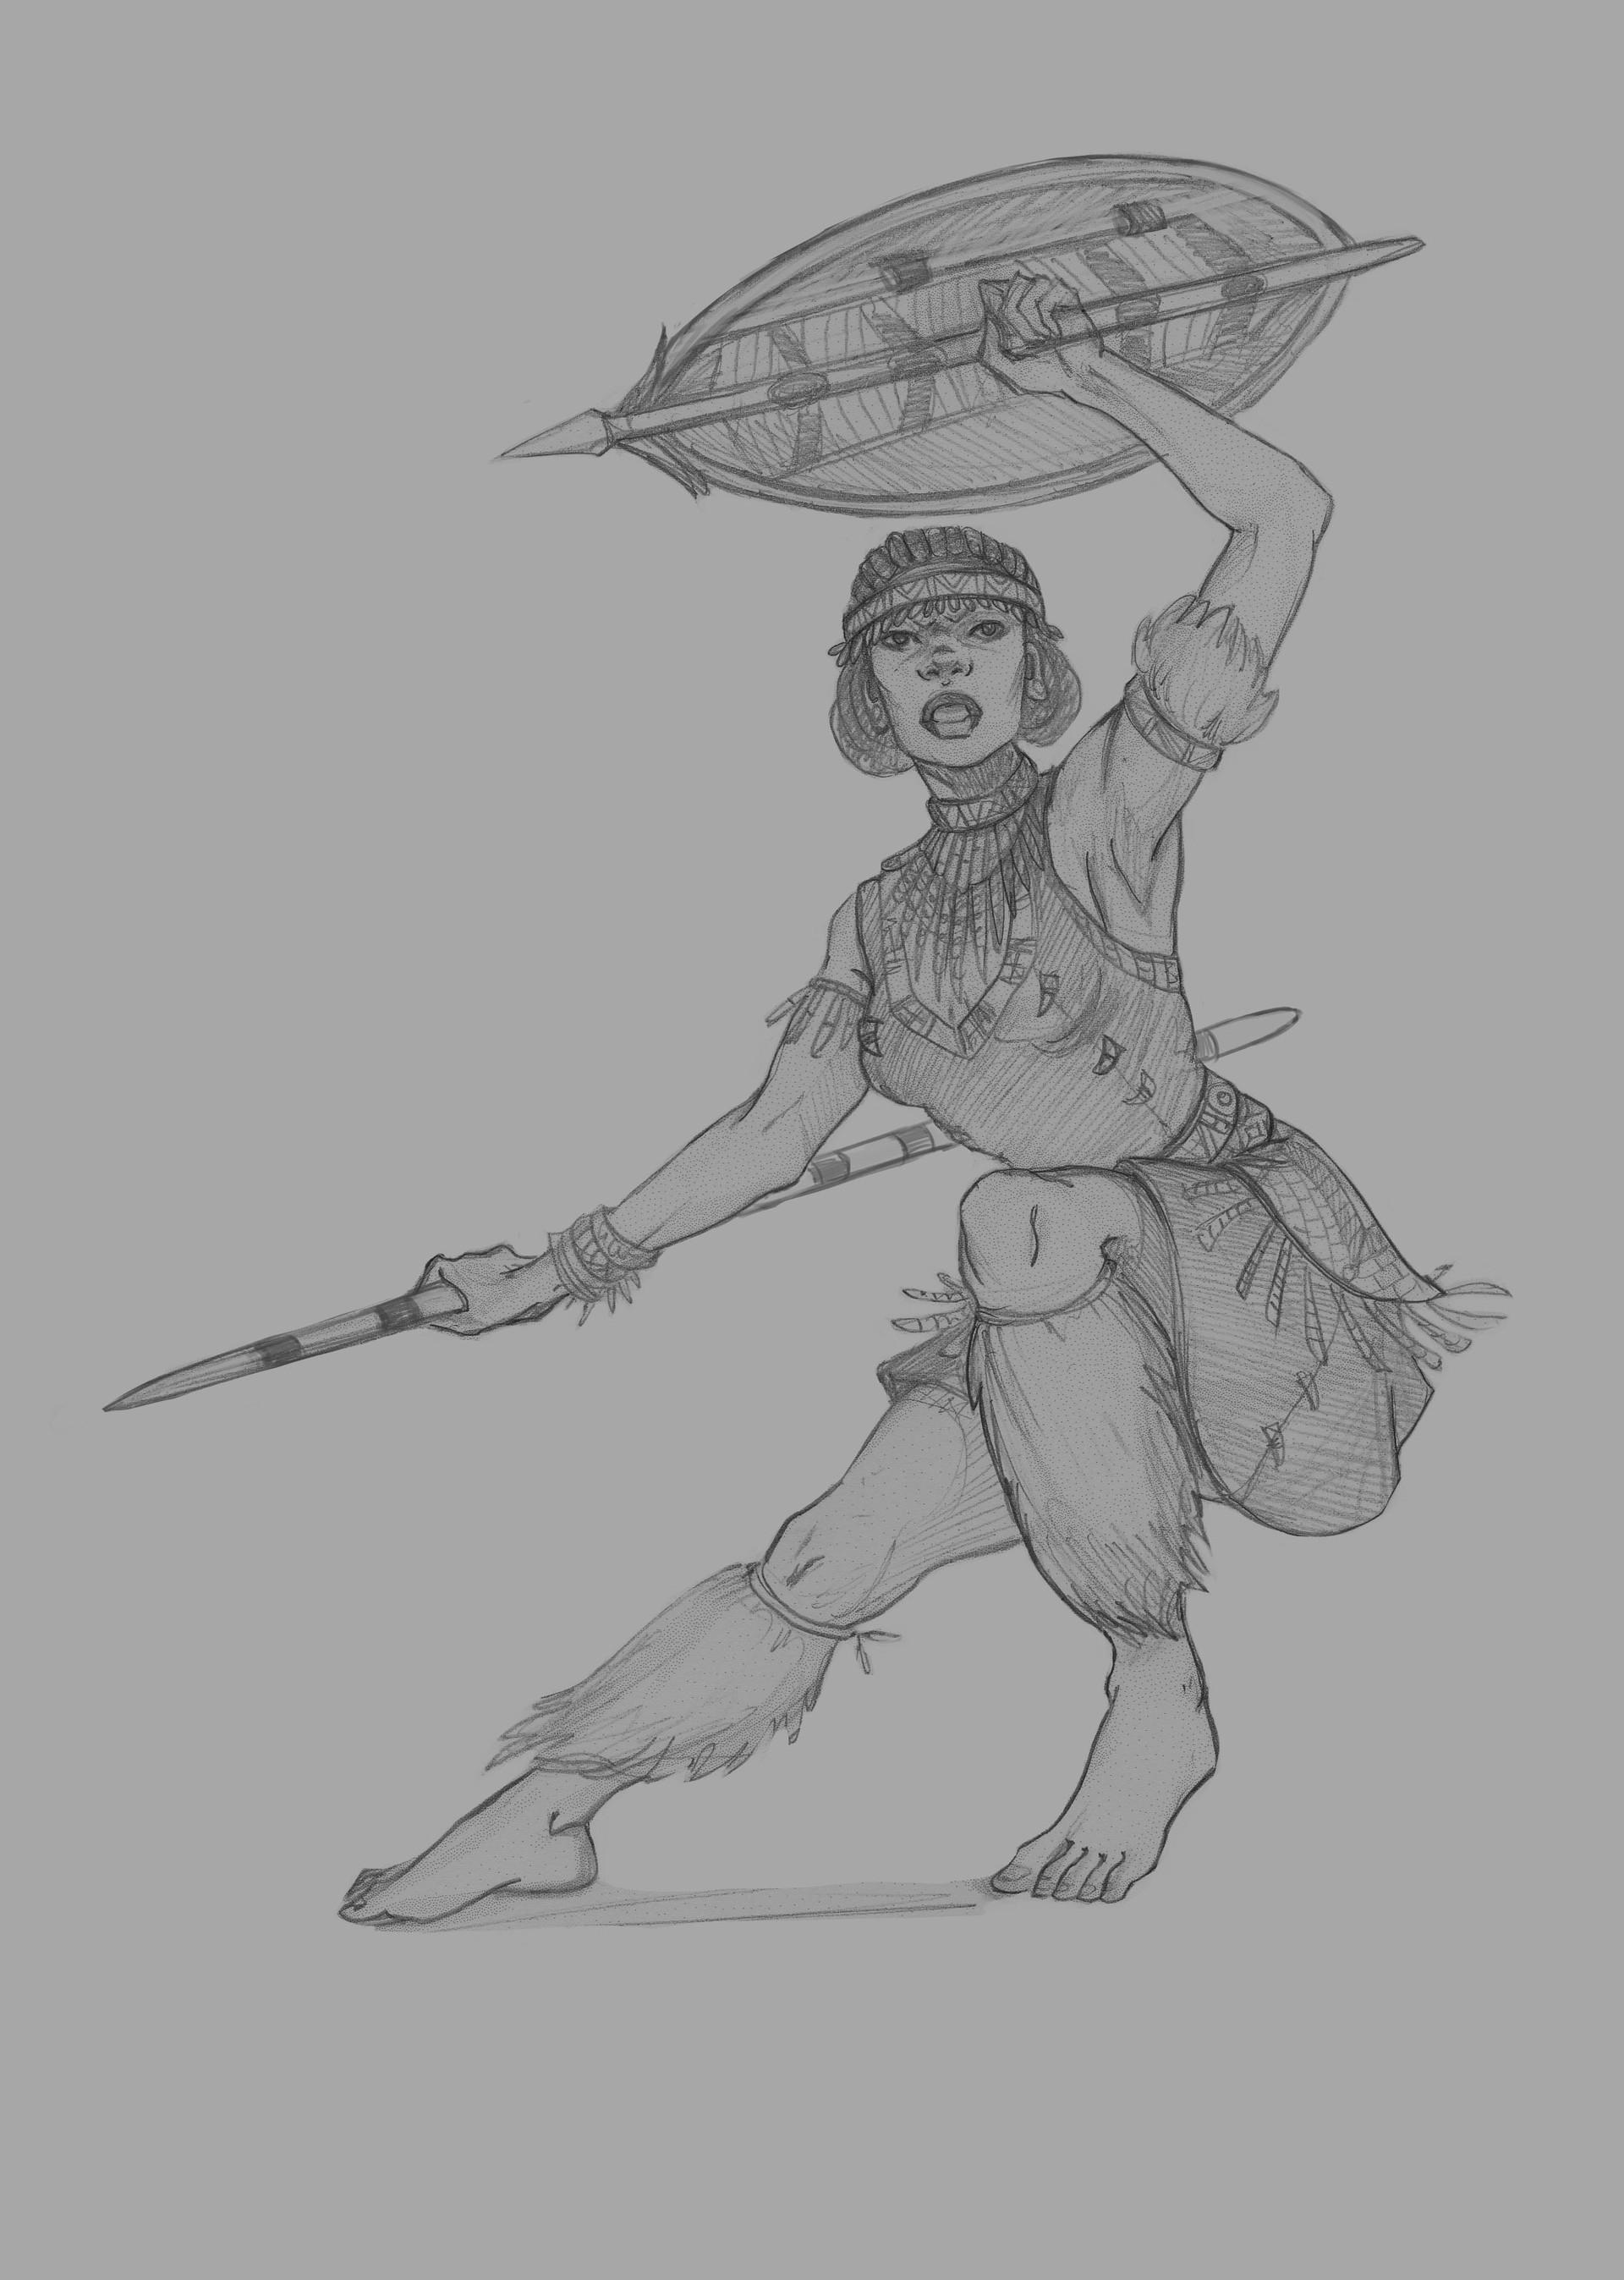 Beatrice pelagatti shielded stx sketch